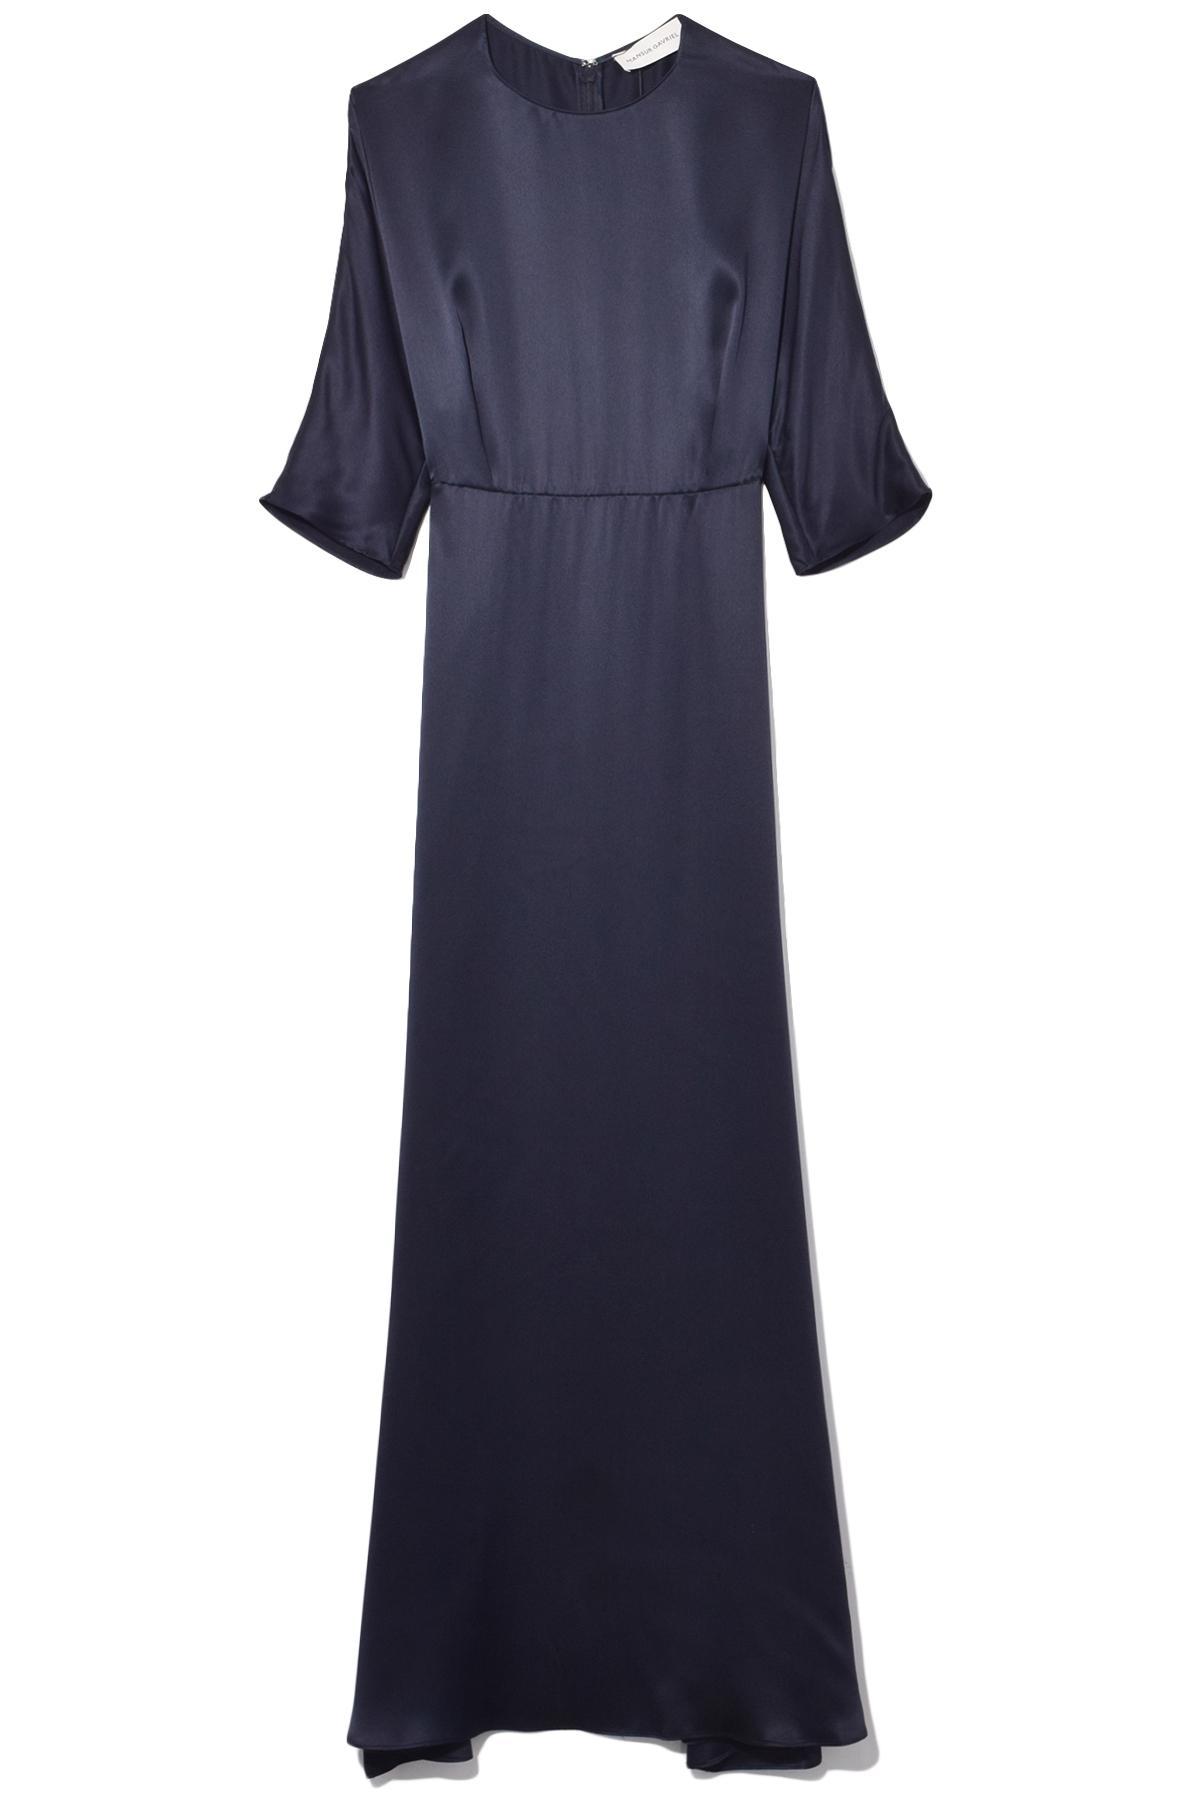 Gavriel Blue Lyst Dress Blu Silk Charmeuse Mansur Fine In WYH2eED9I